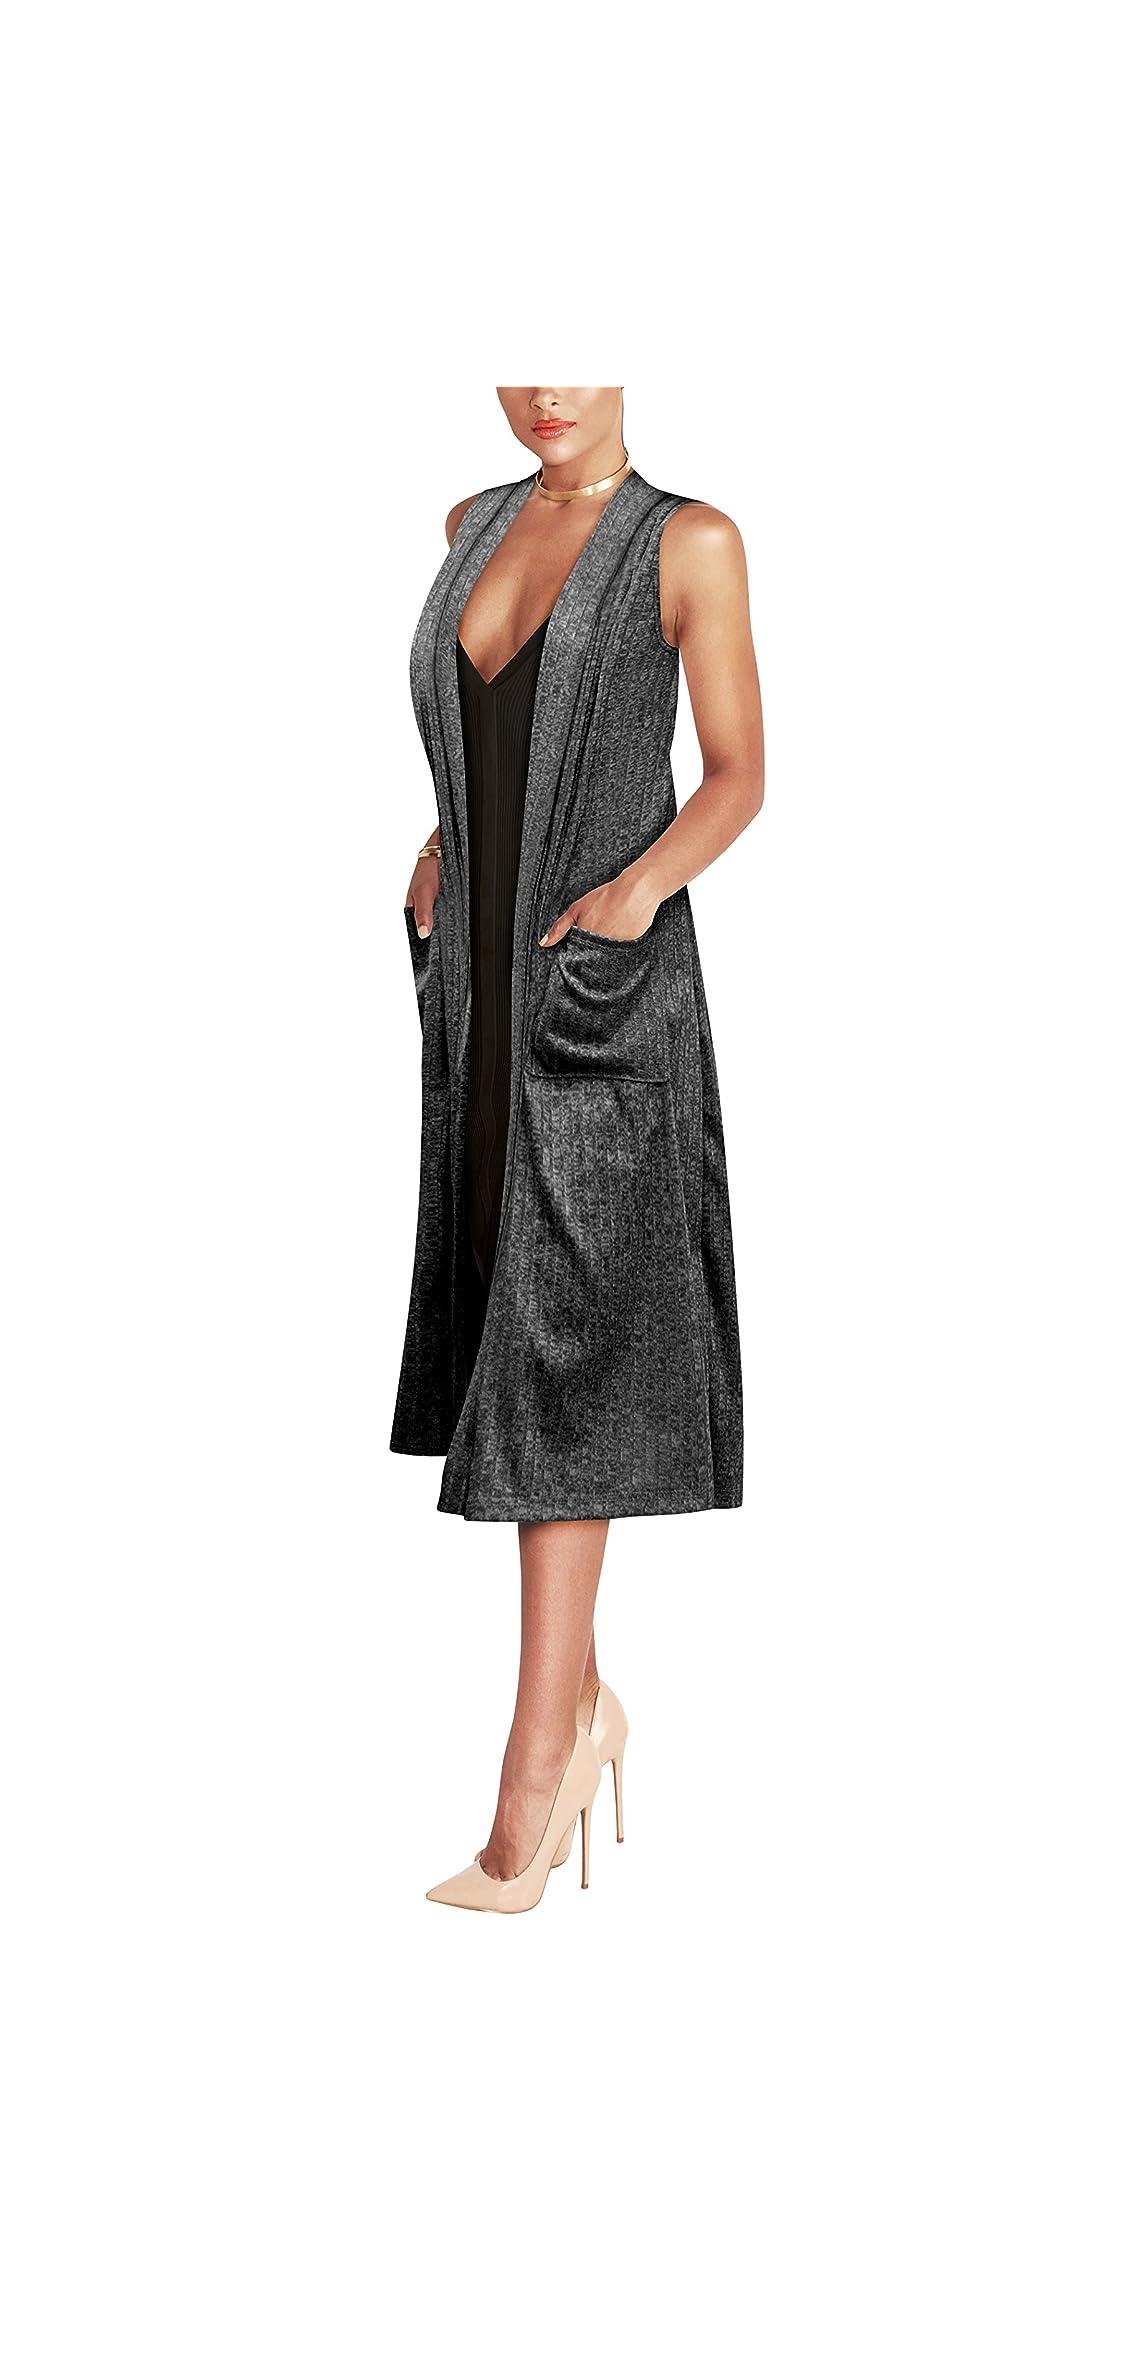 Womens Casual Sleeveless/short Sleeve Open